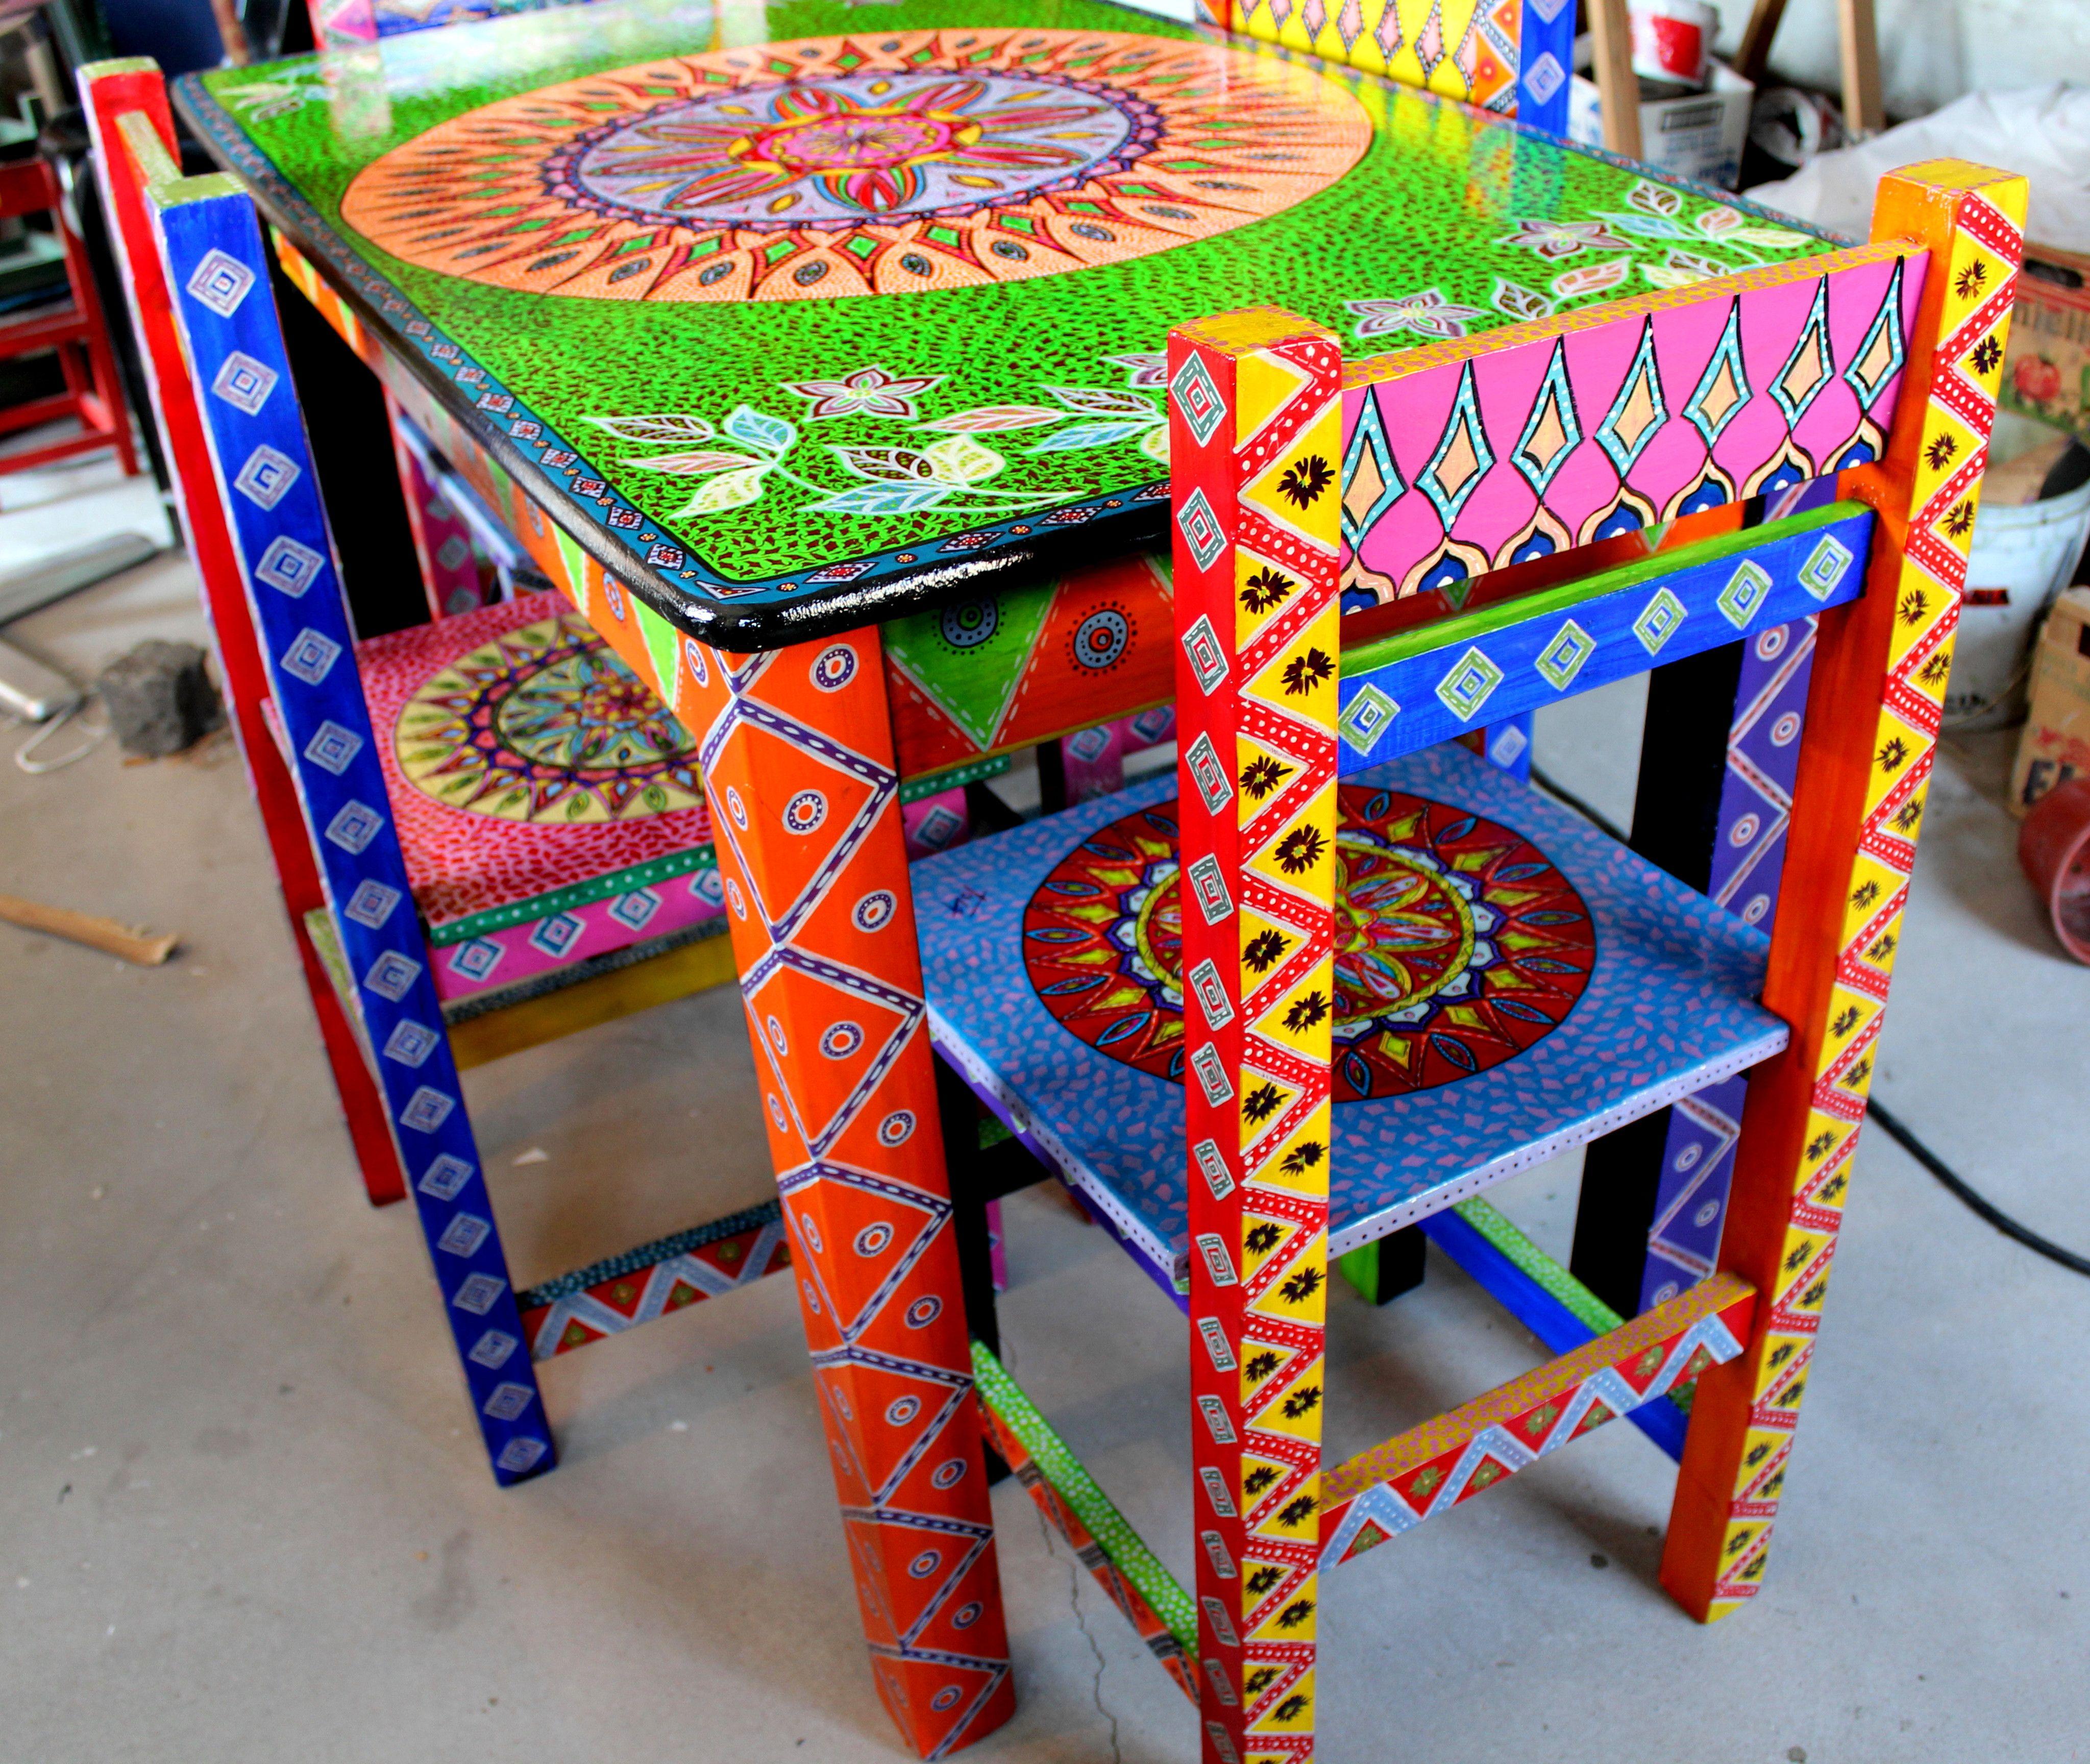 Mesa y sillas pintadas a mano dise o unico muebles - Baules pintados a mano ...